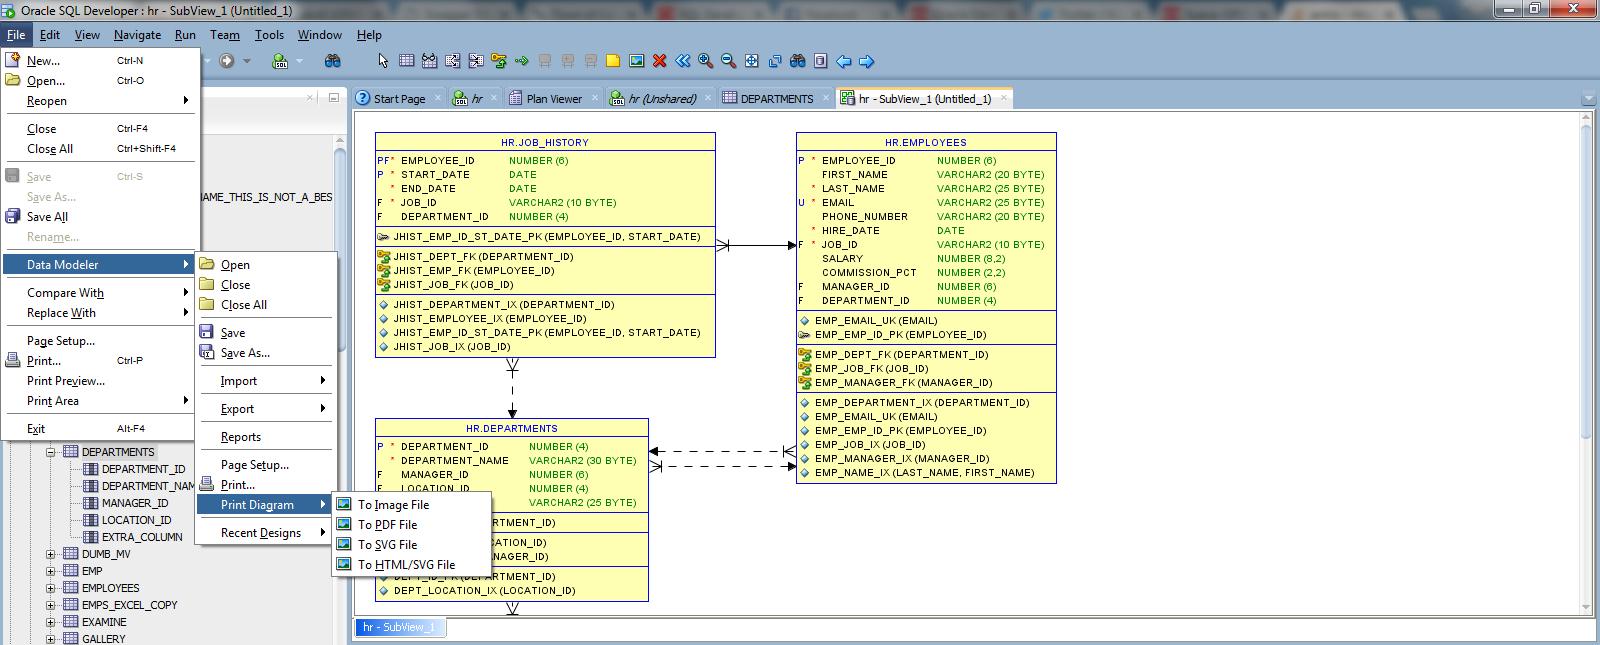 How To Export Erd Diagram To Image In Oracle Data Modeler inside Er Diagram In Sql Developer 4.1